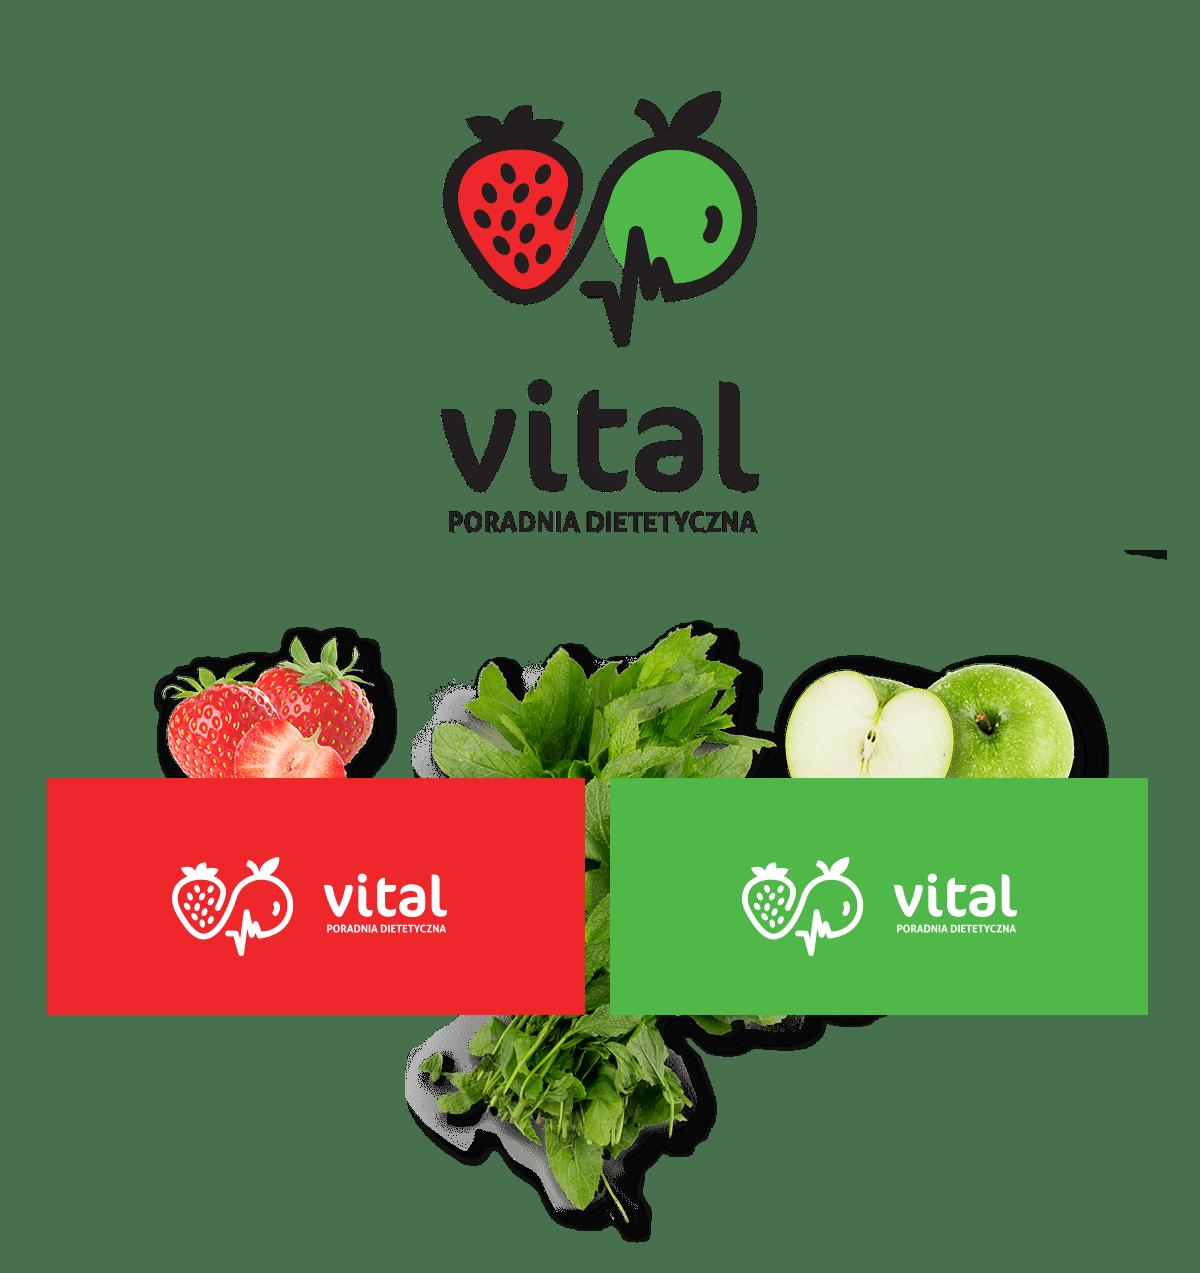 vital-projekt-logo-dla-poradni-dietetycznej